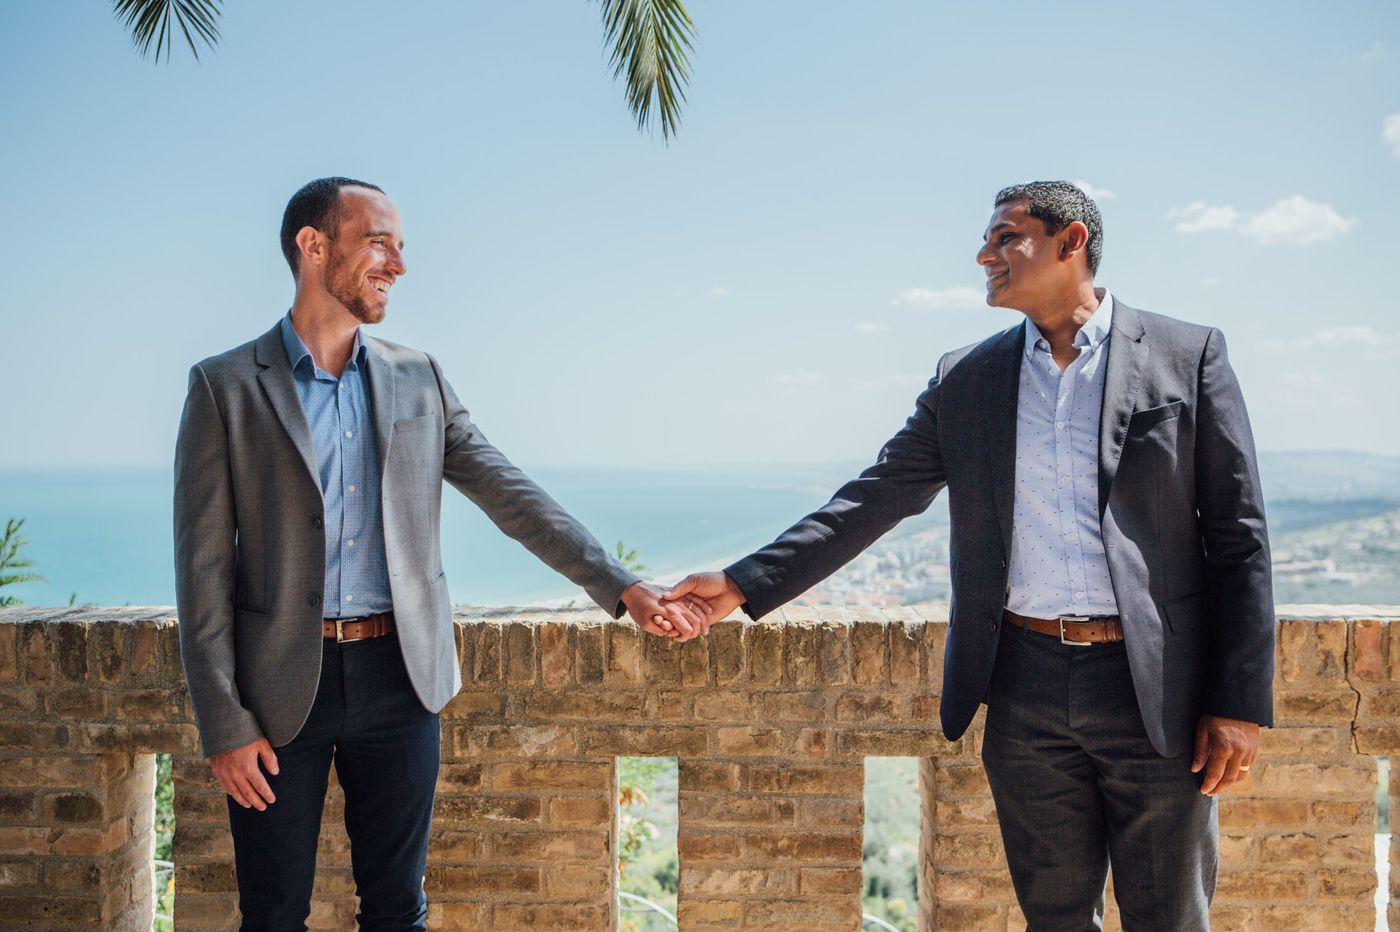 Philadelphia weddings: Kyle D'Ascenzo and Avinash Raizada